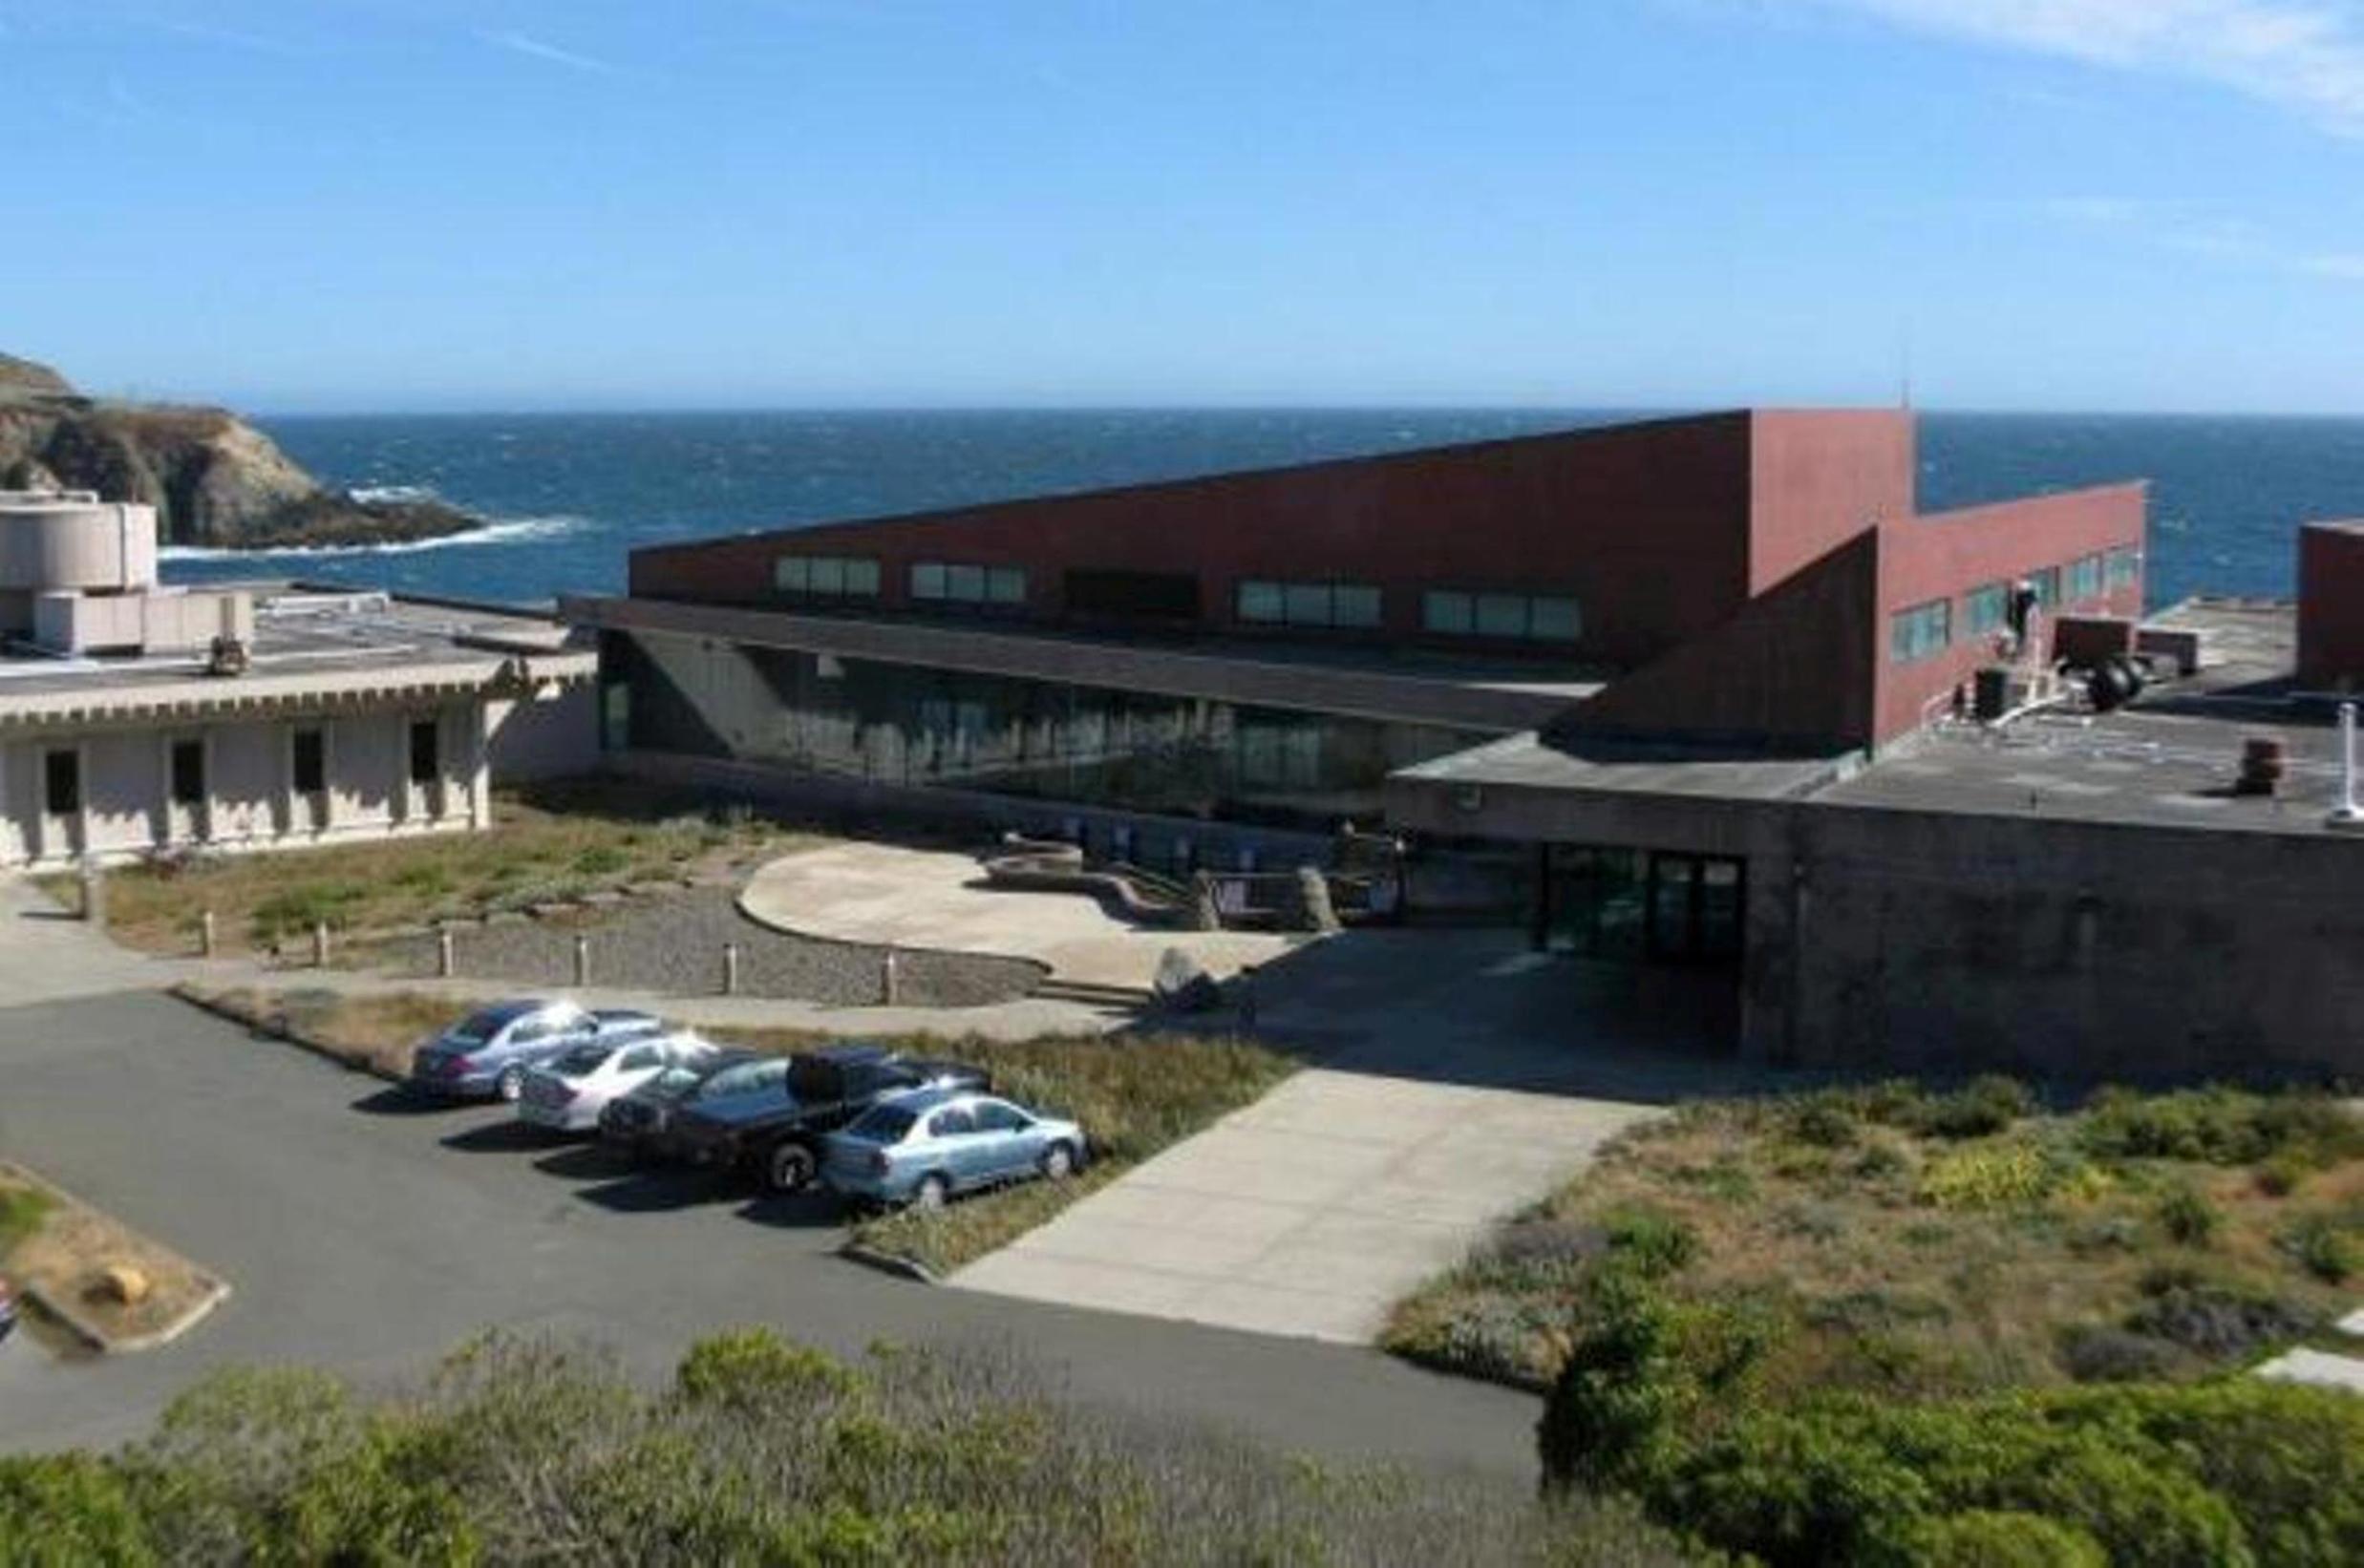 Bodega Marine Laboratory, Bodega Bay, California